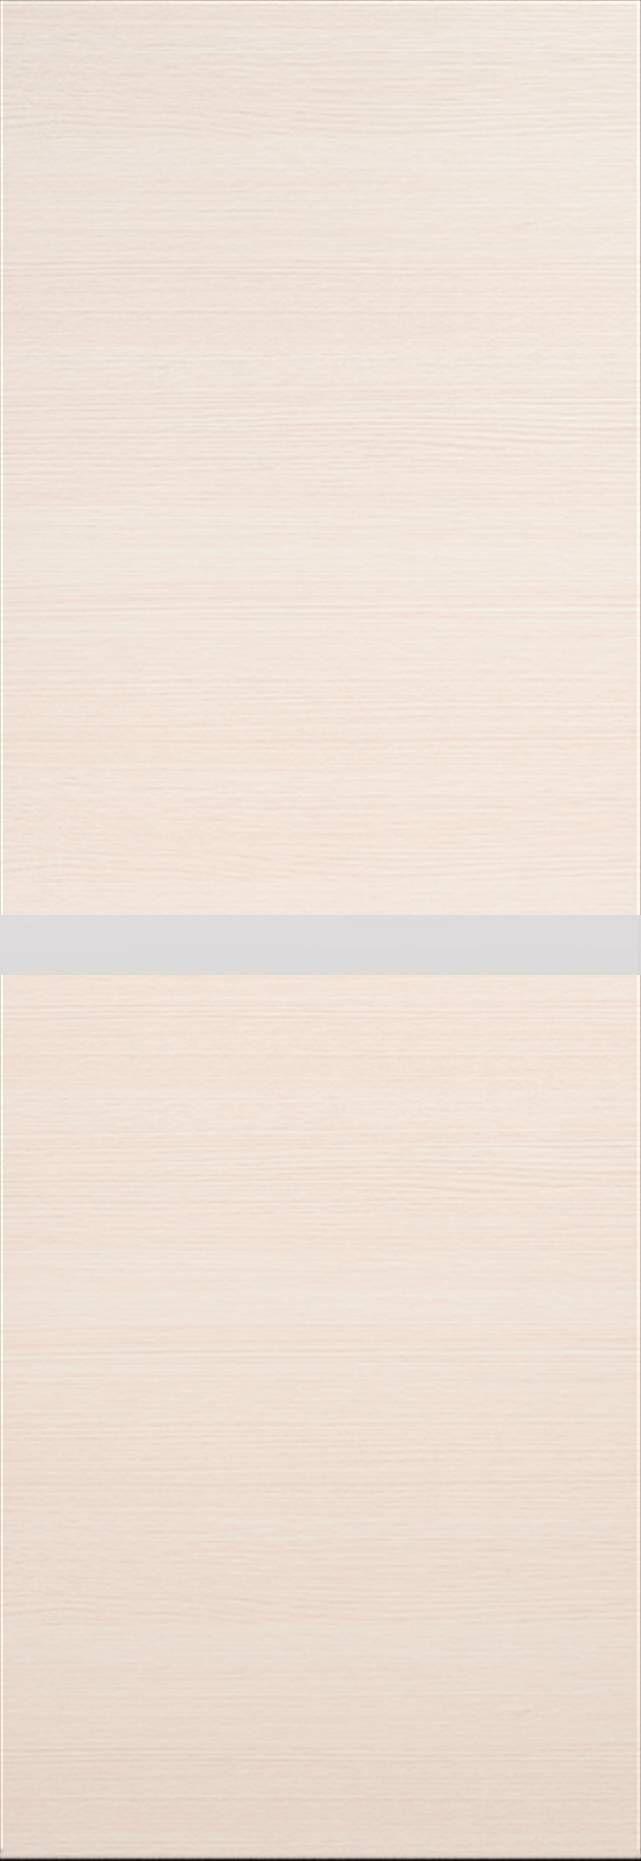 Tivoli Б-4 Invisible цвет - Беленый дуб Без стекла (ДГ)